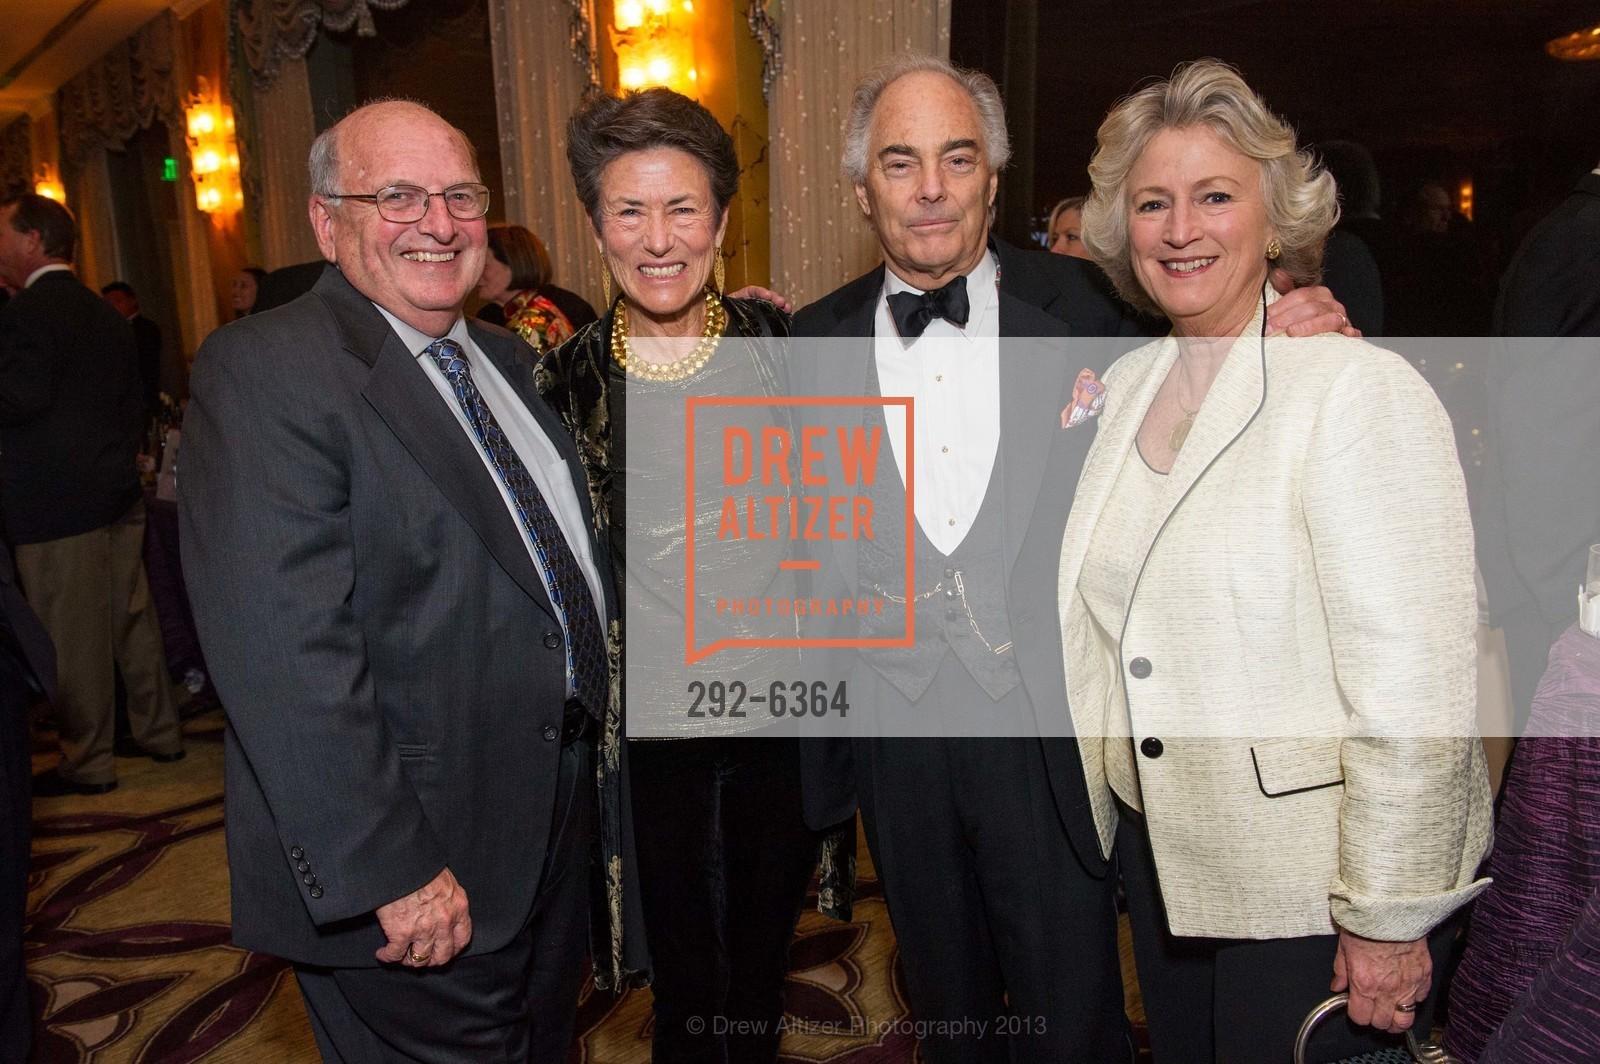 Dennis Fama, Maria Quinn, Martin Quinn, Cheryl Fama, 25th Anniversary Holiday HOB NOB ON THE HILL, US, December 6th, 2013